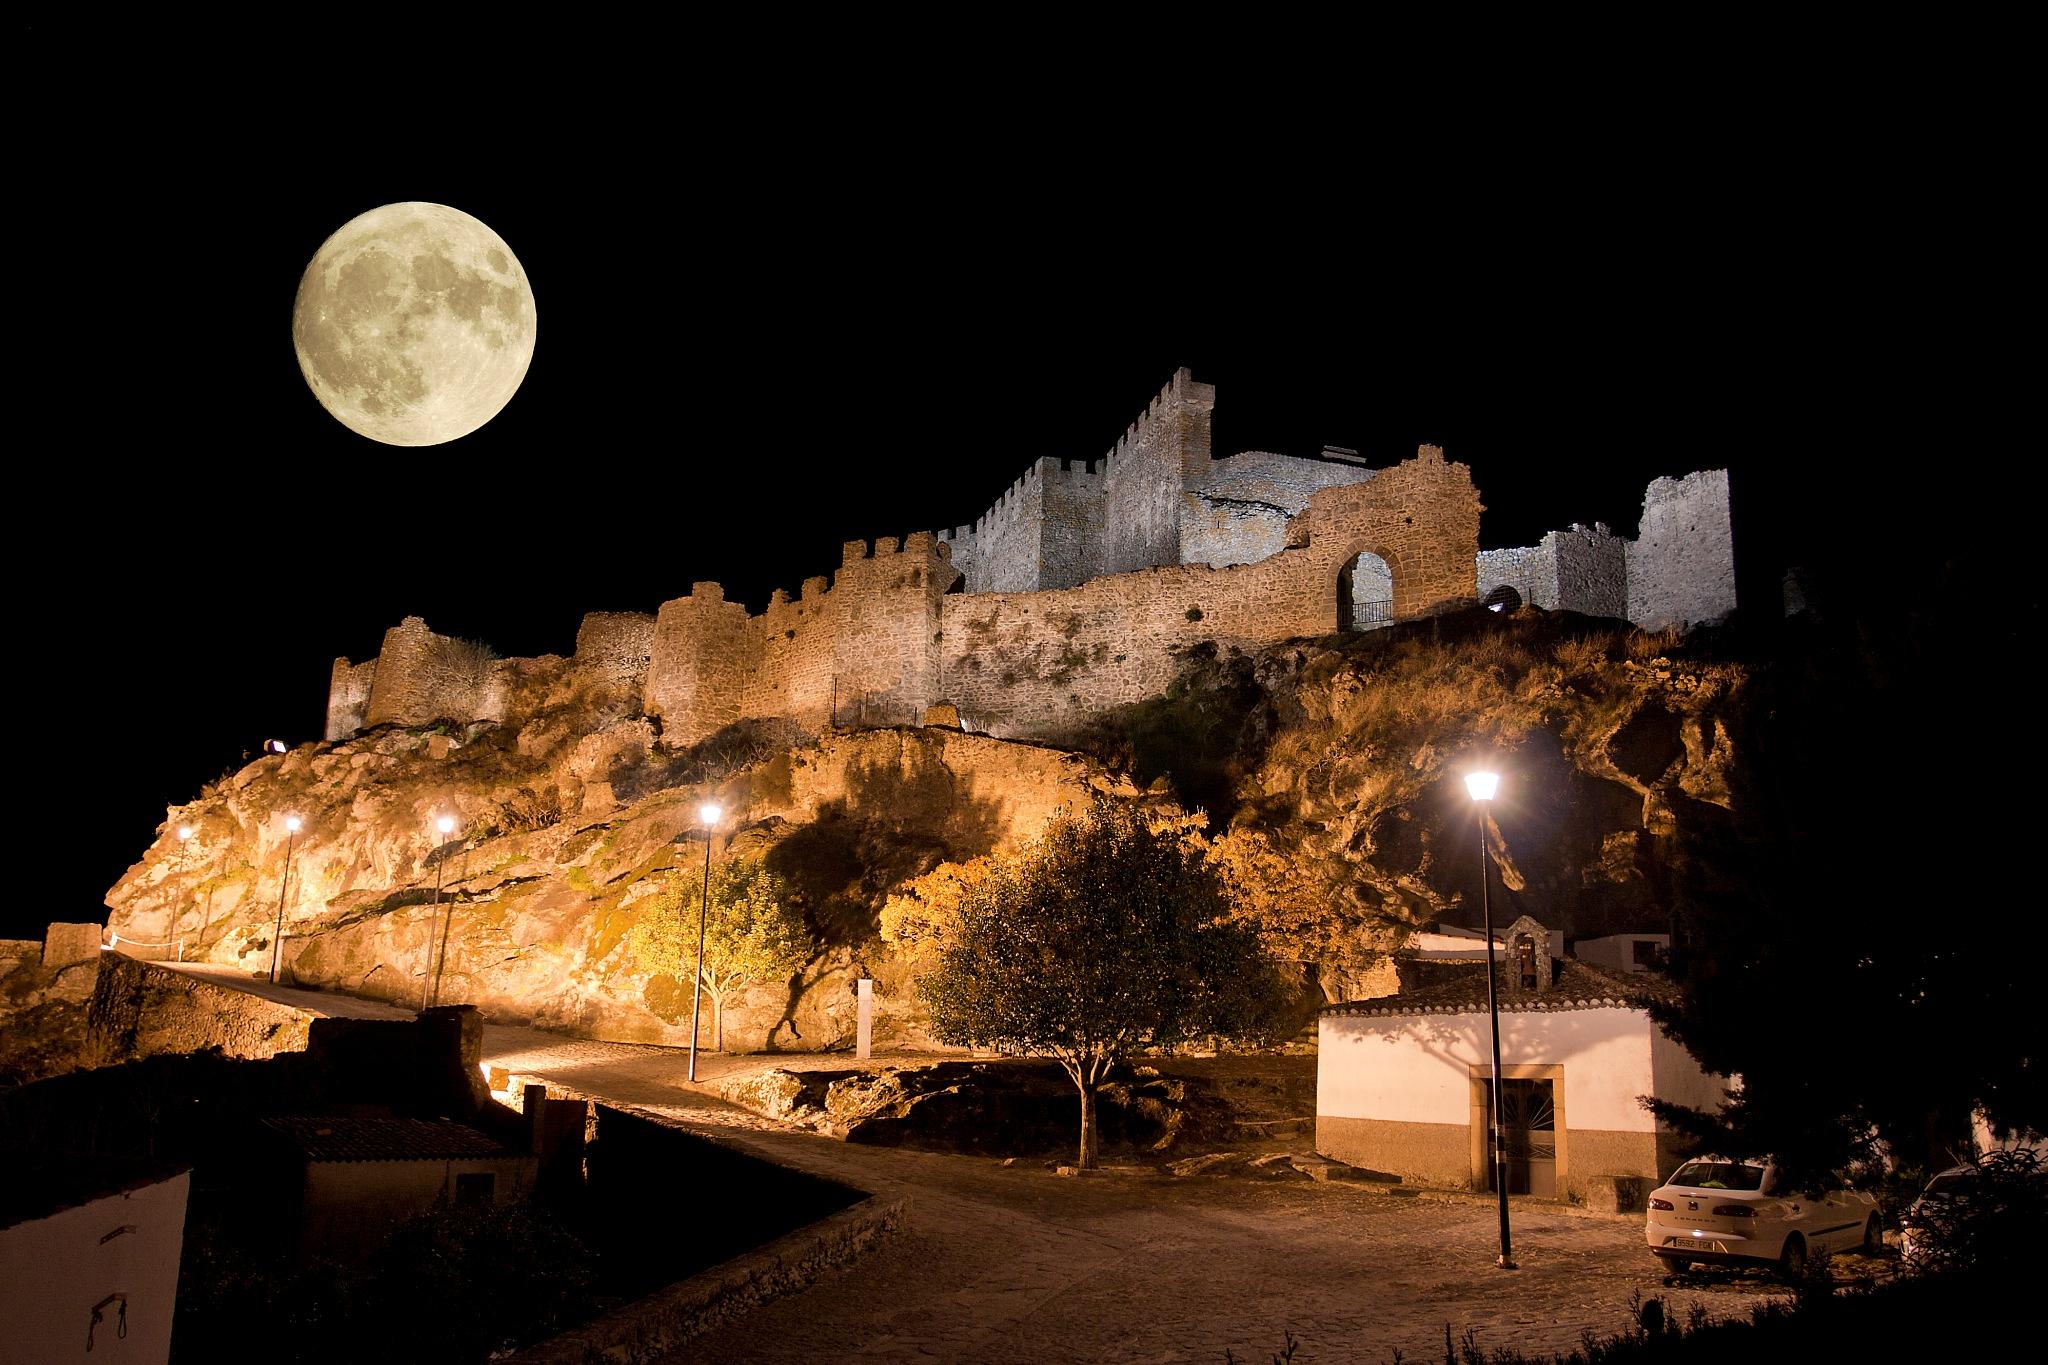 luna falsa by Josemigueldiazcorrales